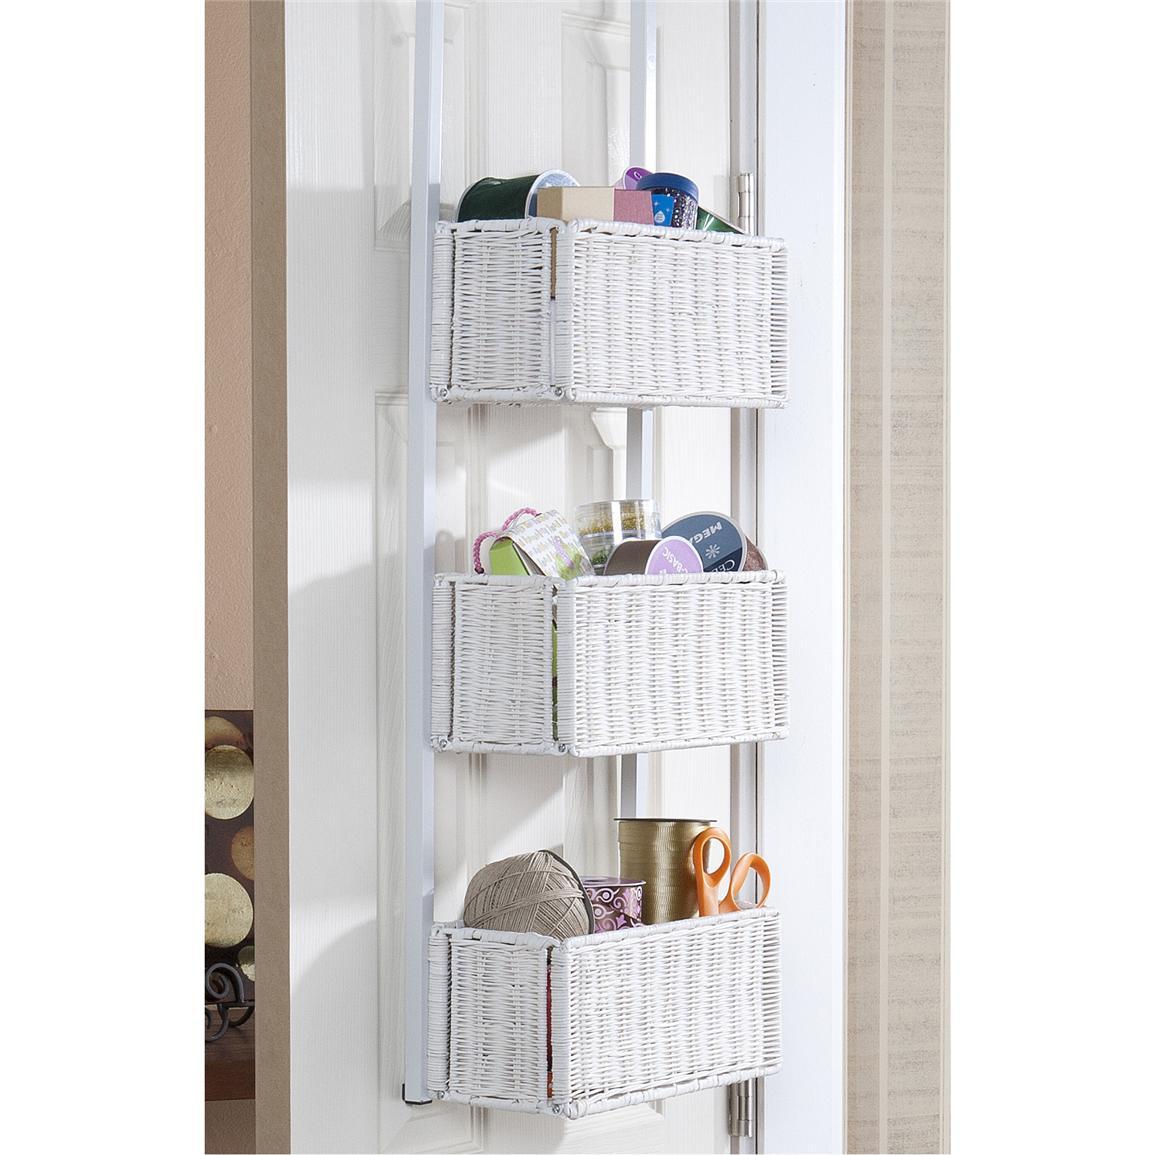 Over the Door Basket Storage  the Nuance of Functional